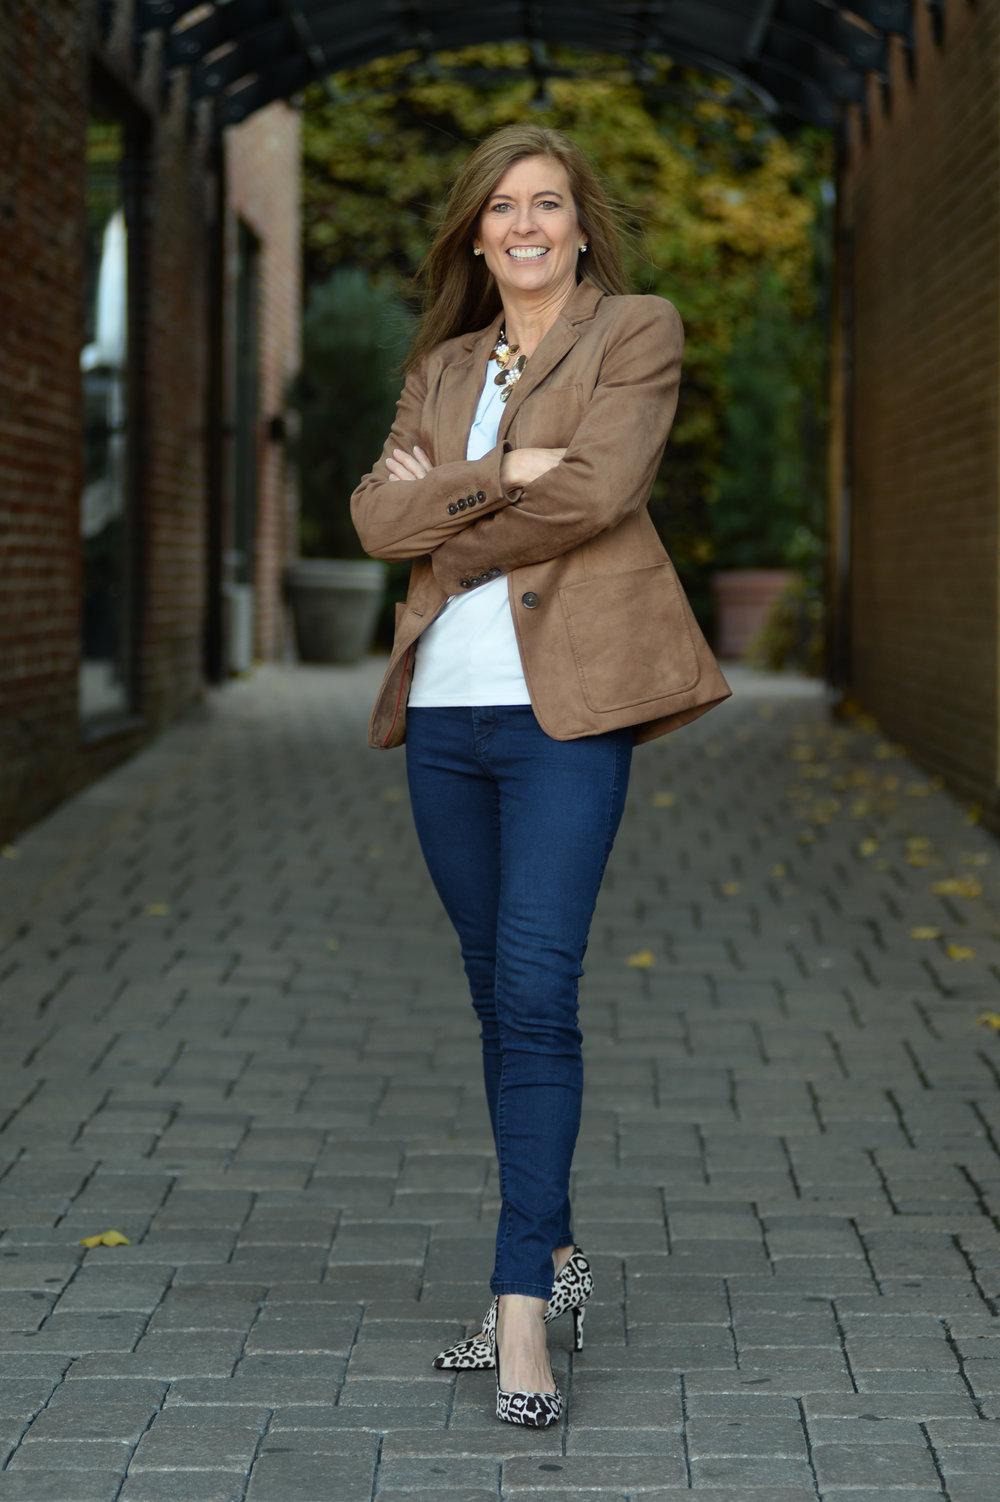 Donna Naumann